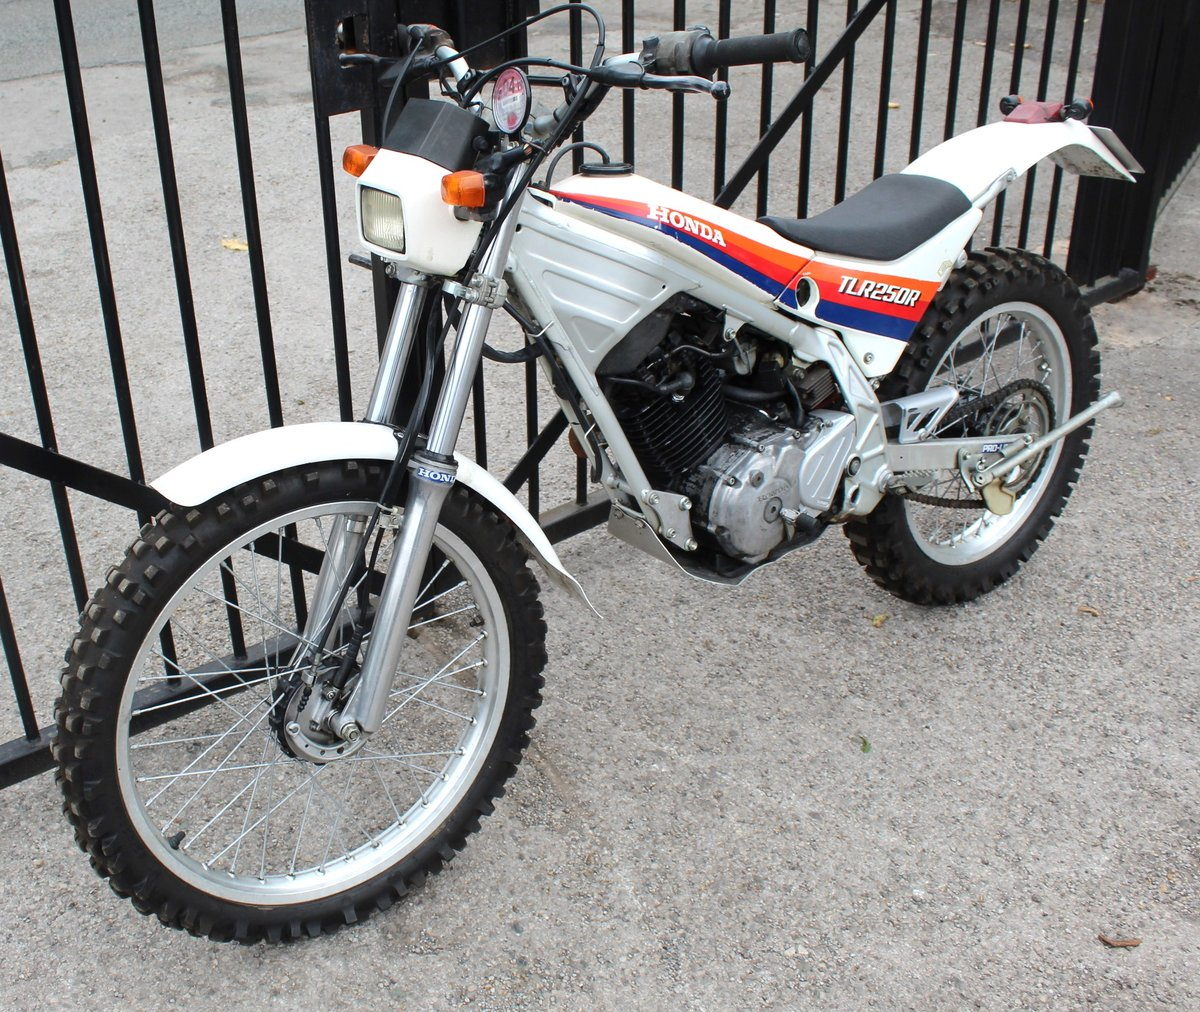 1986 Honda TLR 250 cc Trials Bike Road Registered SOLD (picture 6 of 6)